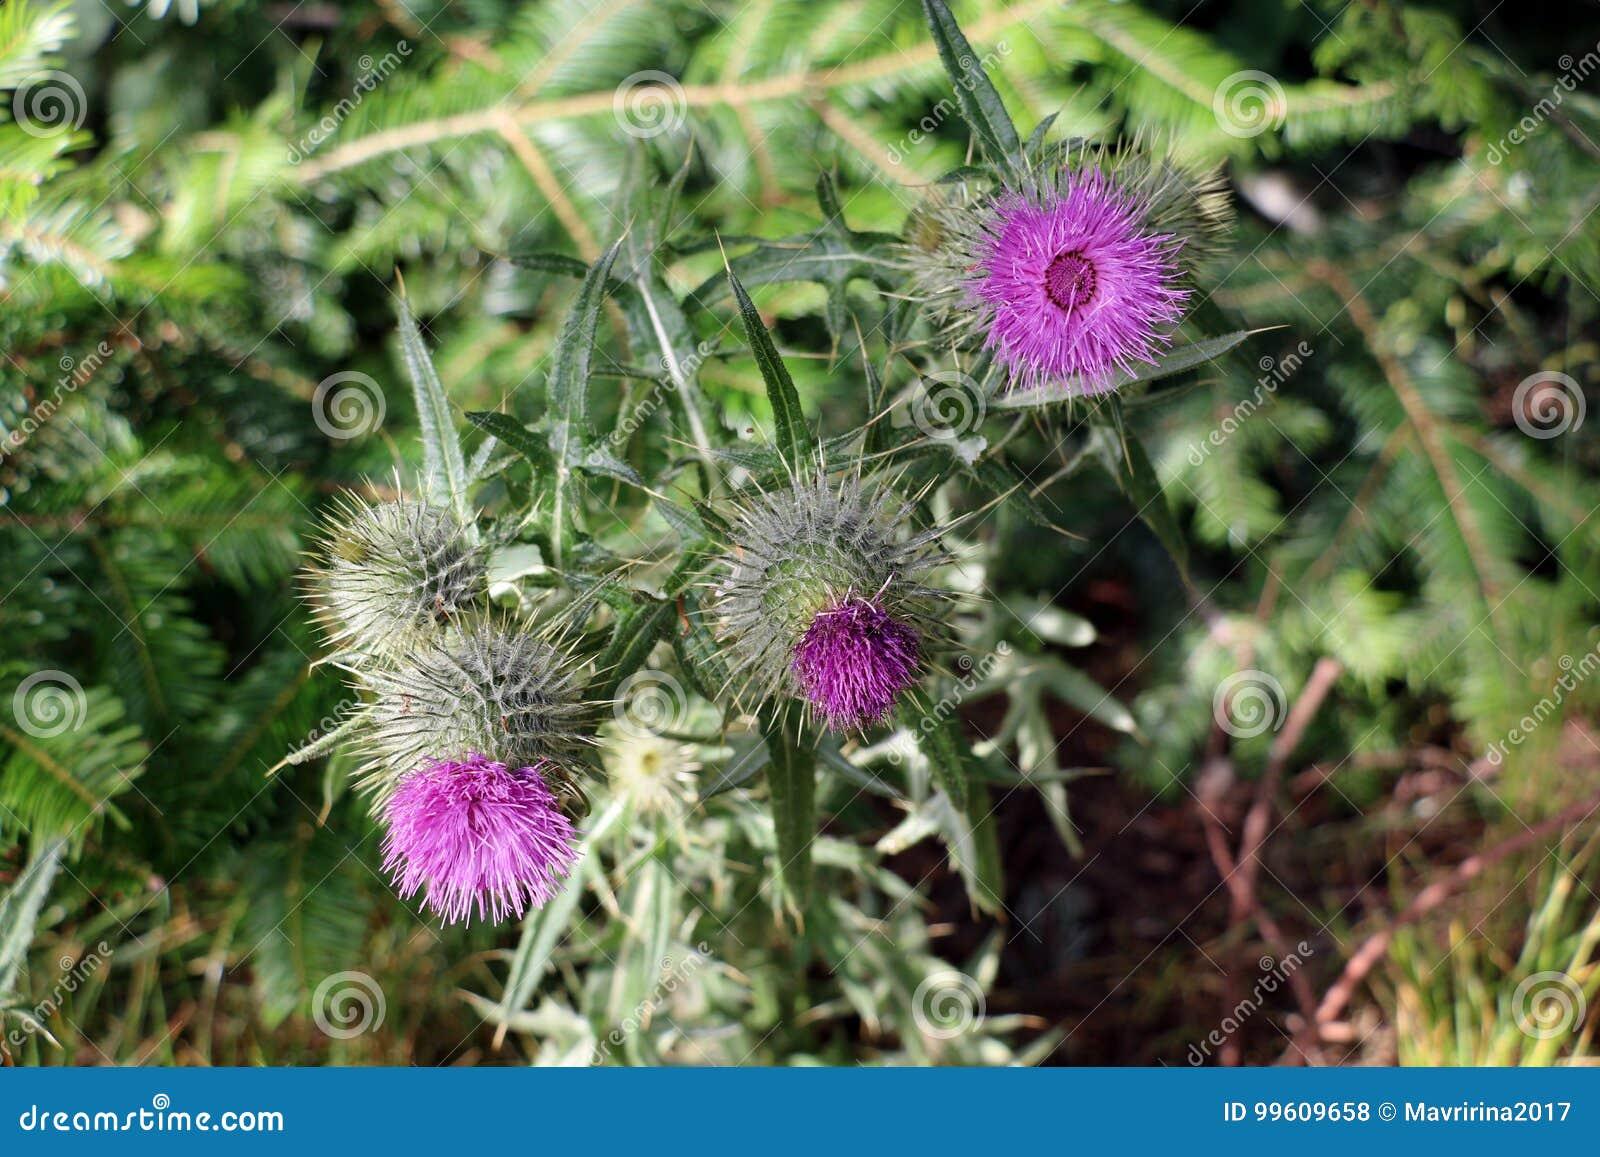 Thistle Flower Symbol Of Scotland Stock Photo Image Of Head